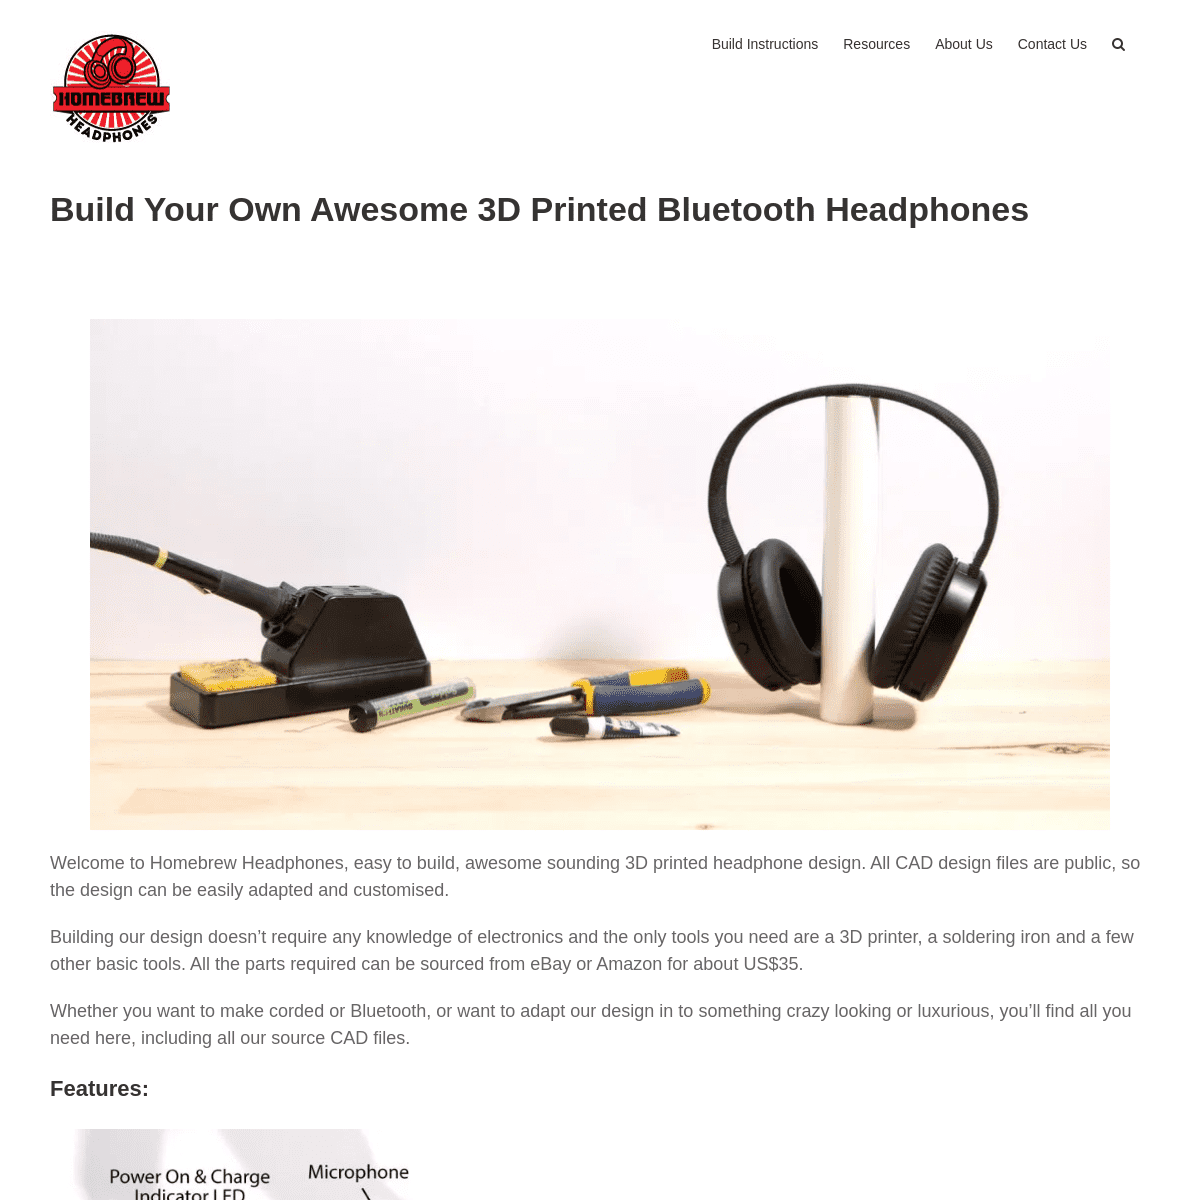 ArchiveBay.com - homebrewheadphones.com - Homebrew Headphones – Open Source 3D Printed Headphone Design